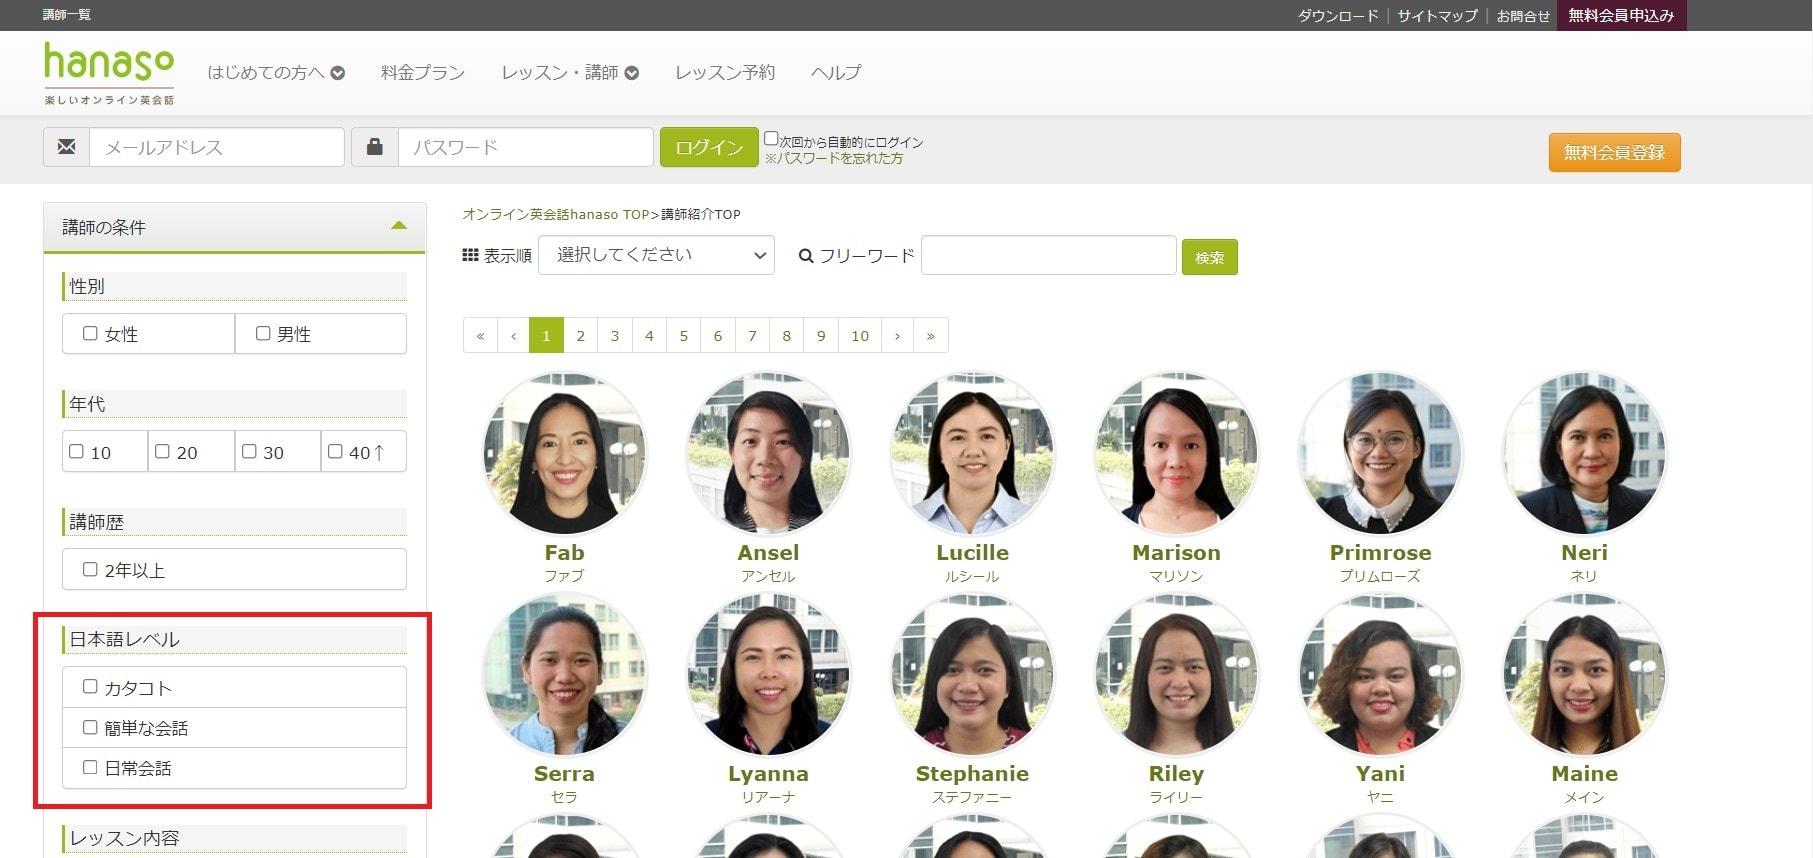 hanasoは日本語対応可の講師を選べる